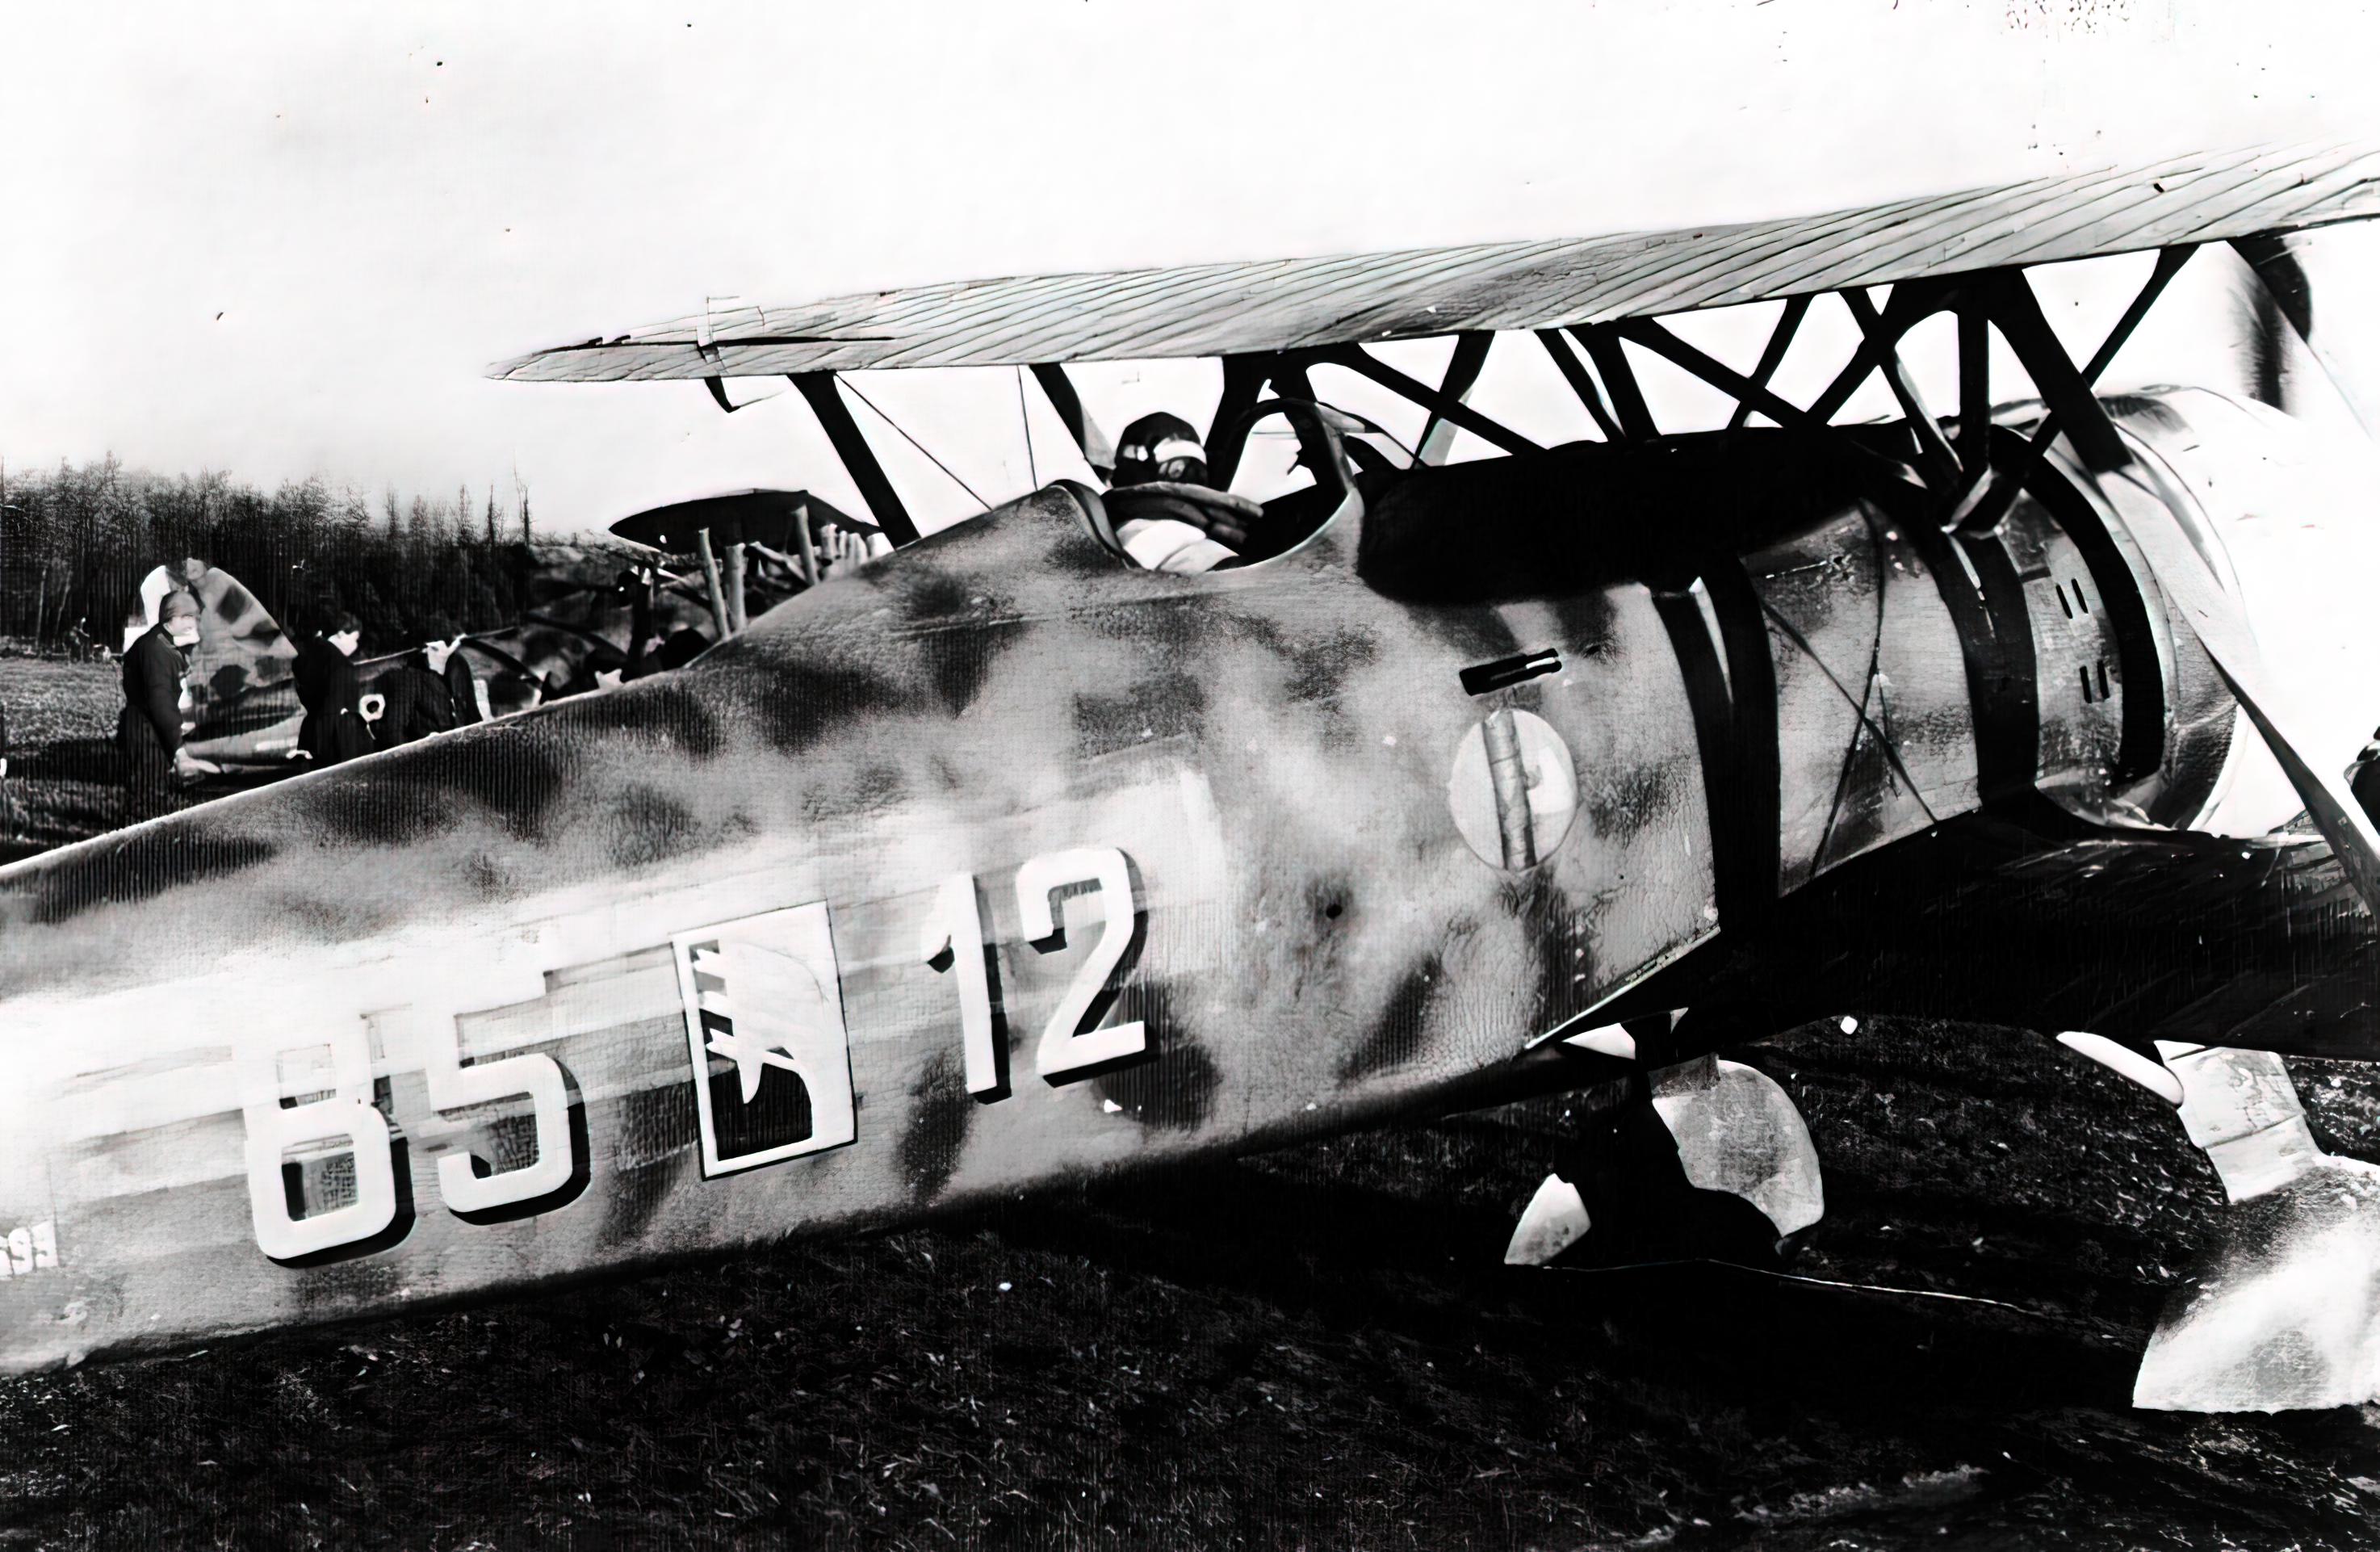 Fiat CR 42 Falco 18.JG56 18G56S85aSA 85 12 Ursel Belgium 1940 02